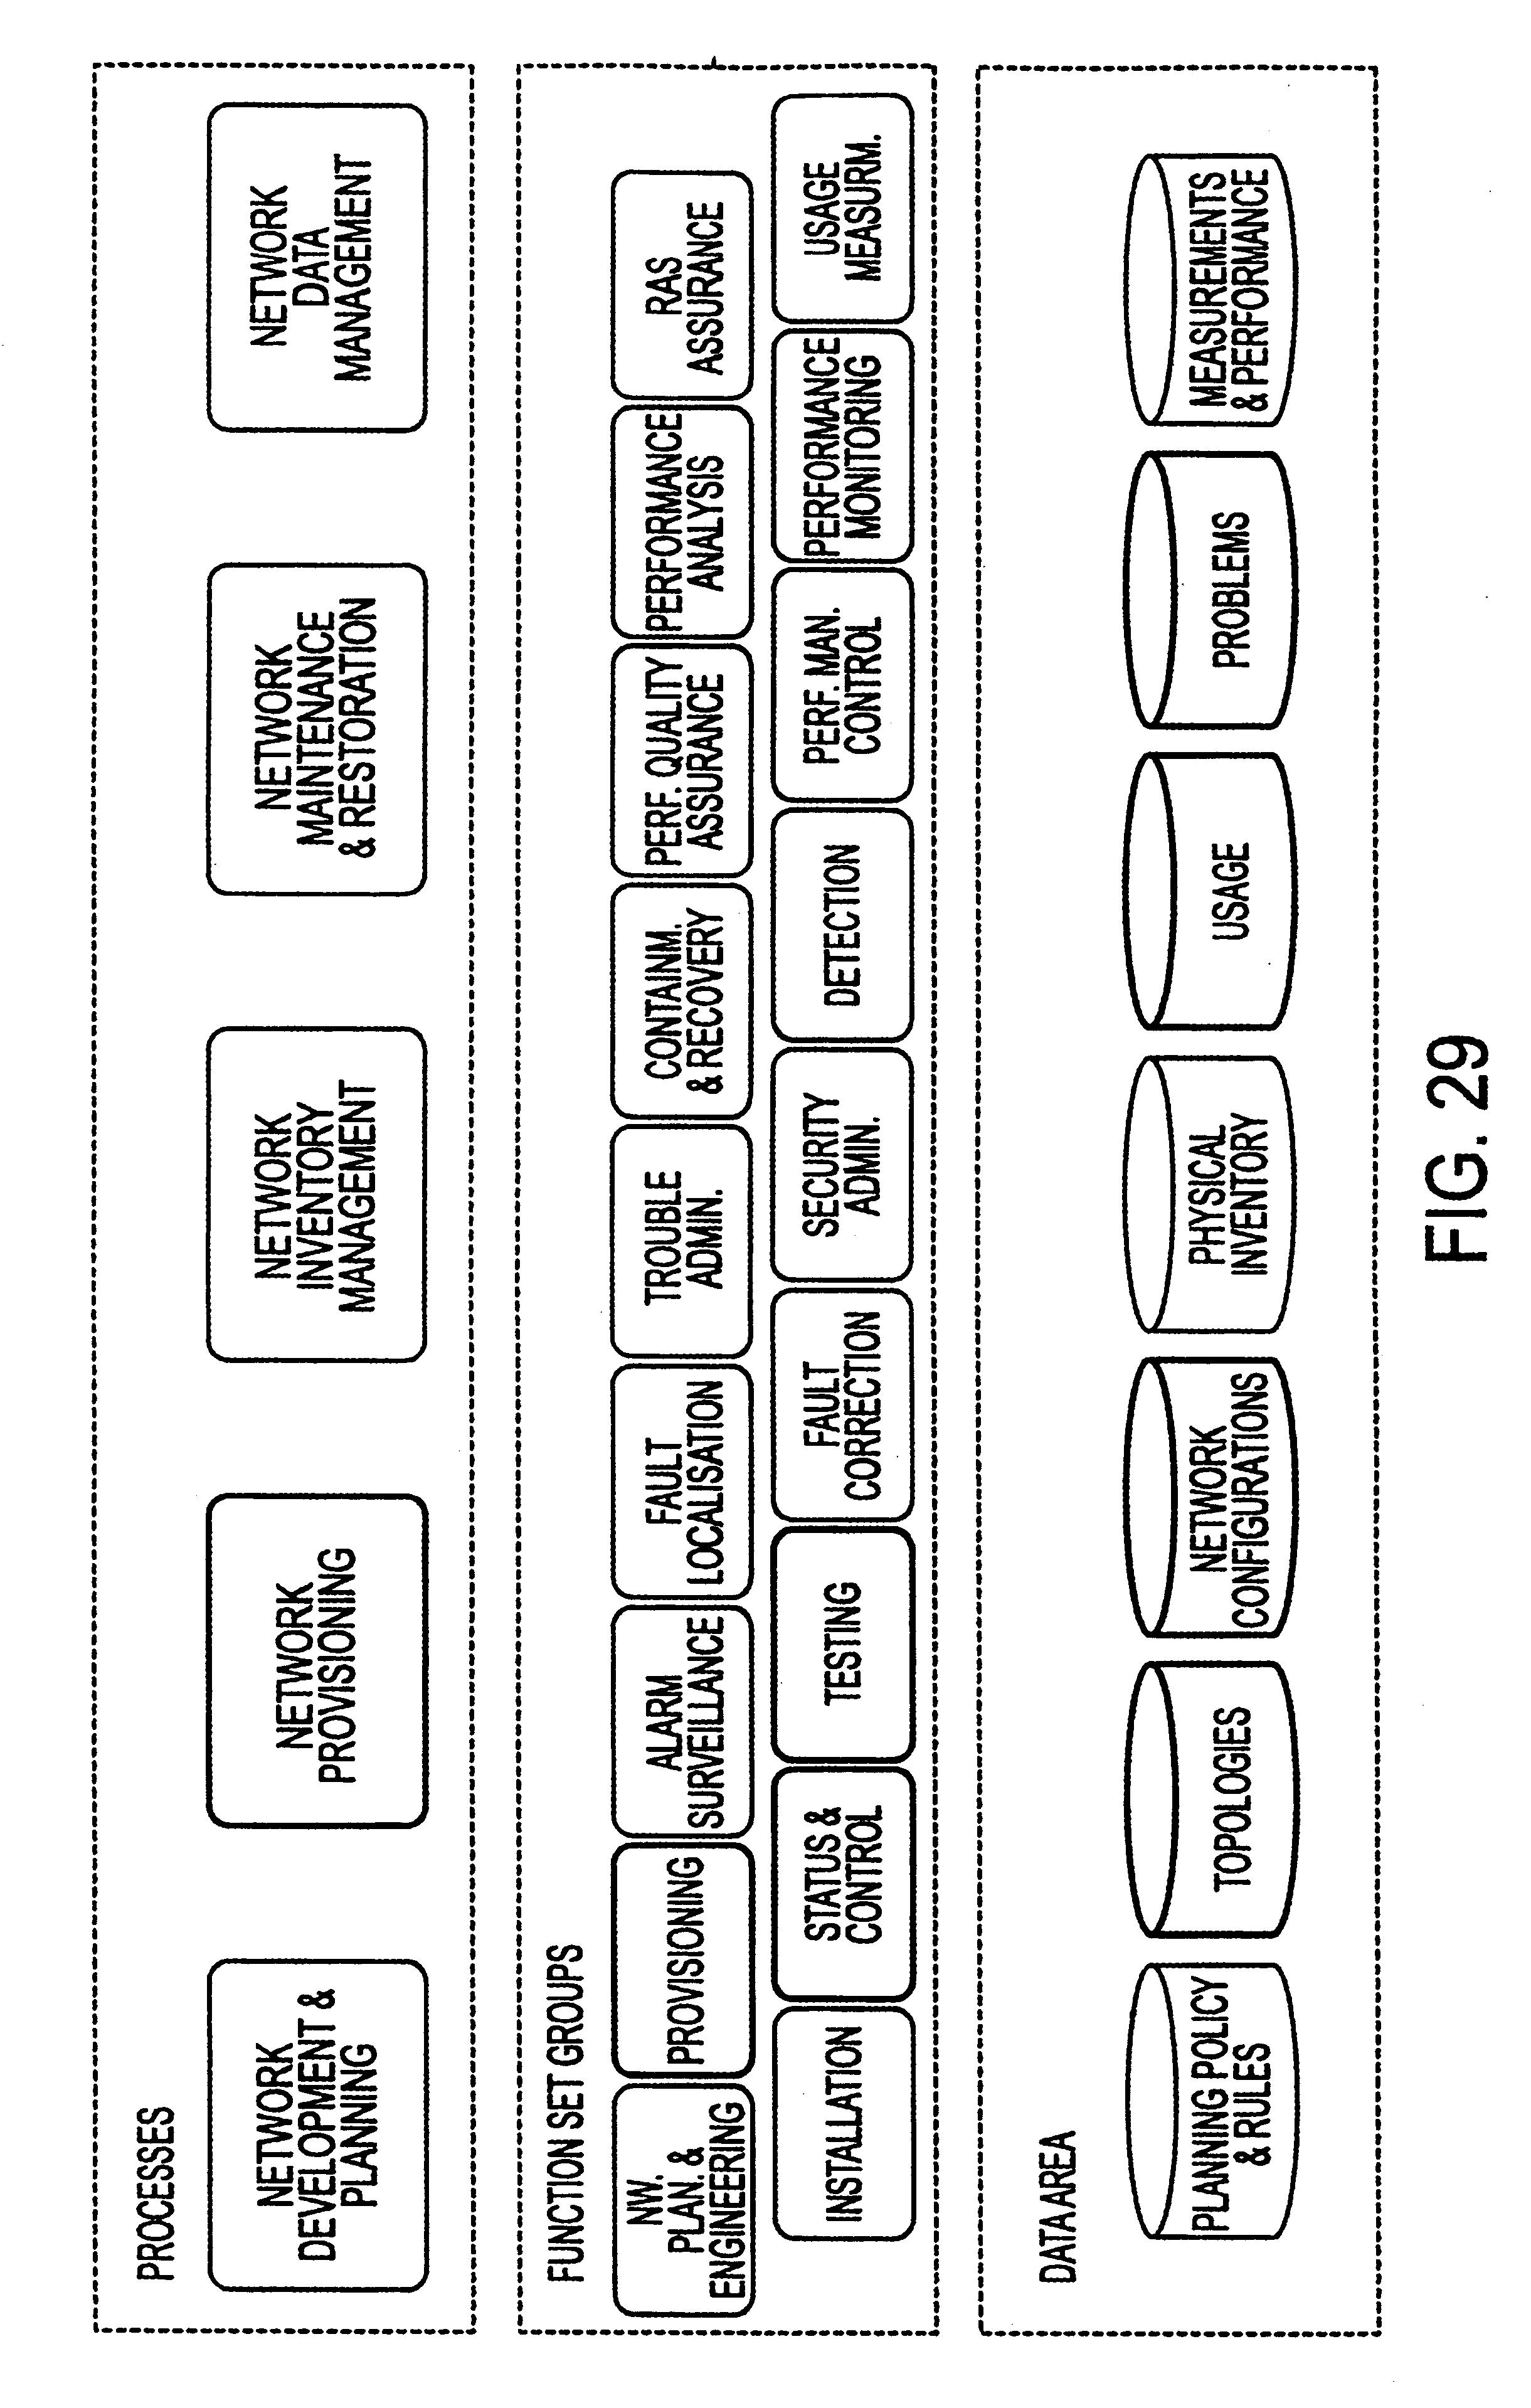 Patent US 6,427,132 B1